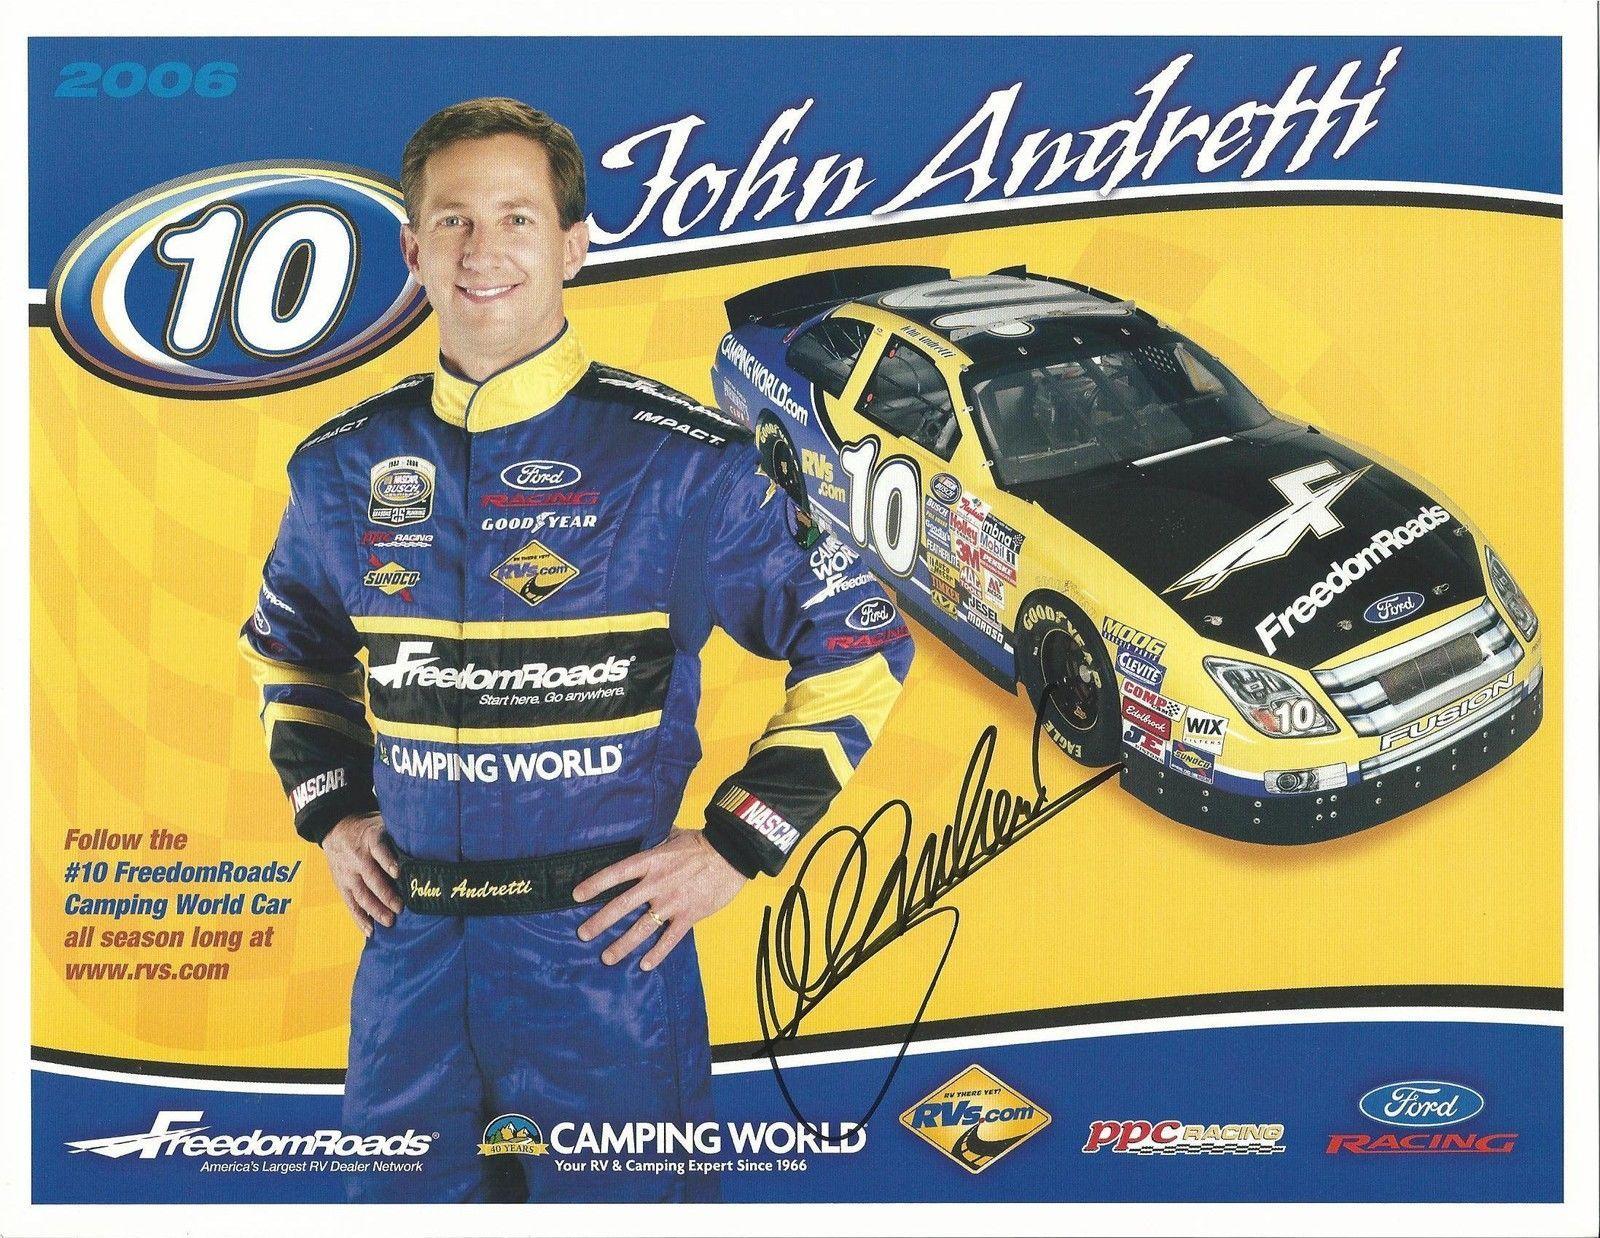 2006 JOHN ANDRETTI #10 FREEDOMROADS POSTCARD SIGNED